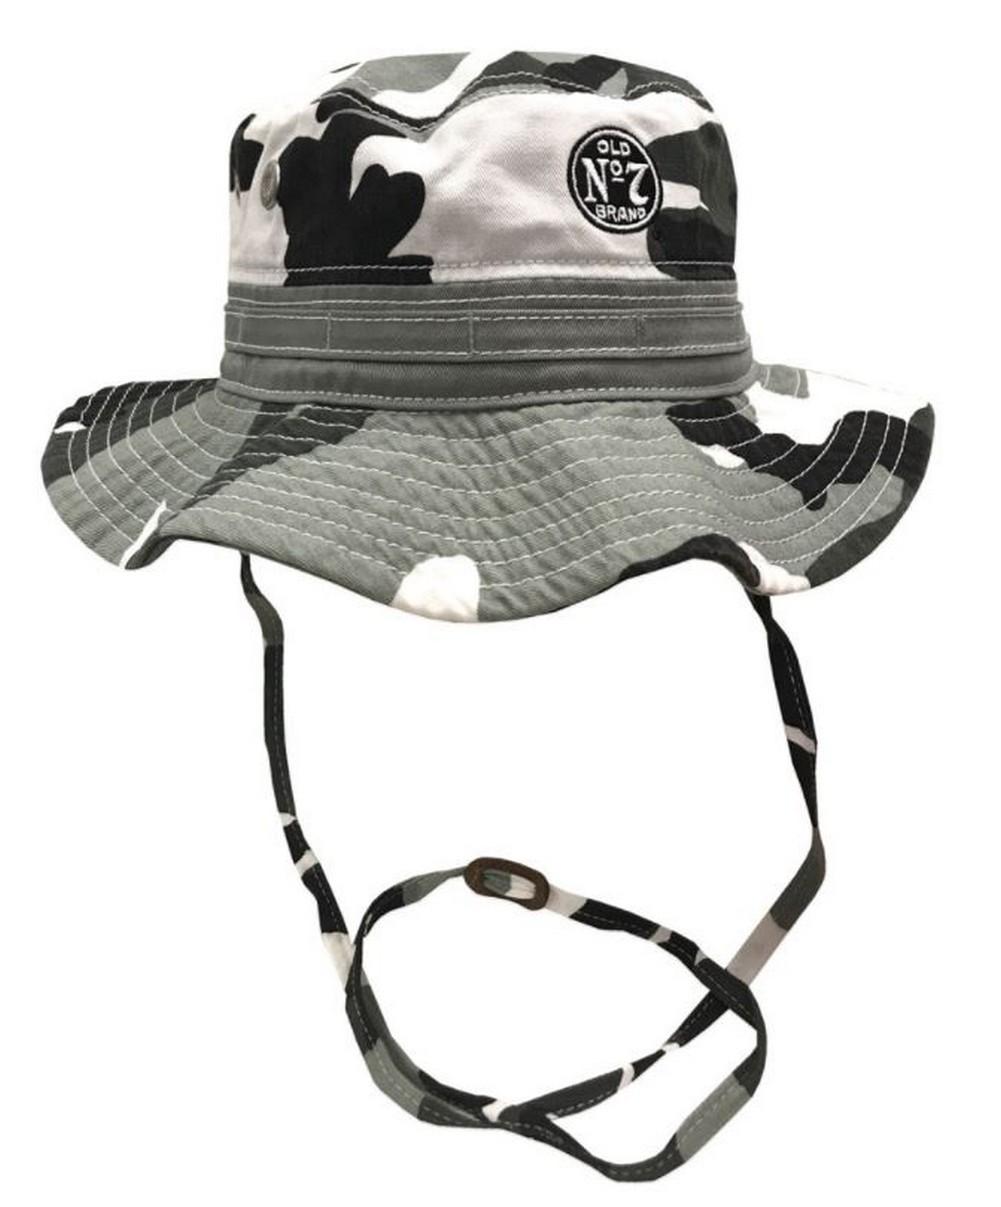 Jack Daniels Men s Wide Brim Boonie Fishing Bucket Hat Gray Camouflage  JD77-124 7d73cfc3ddd